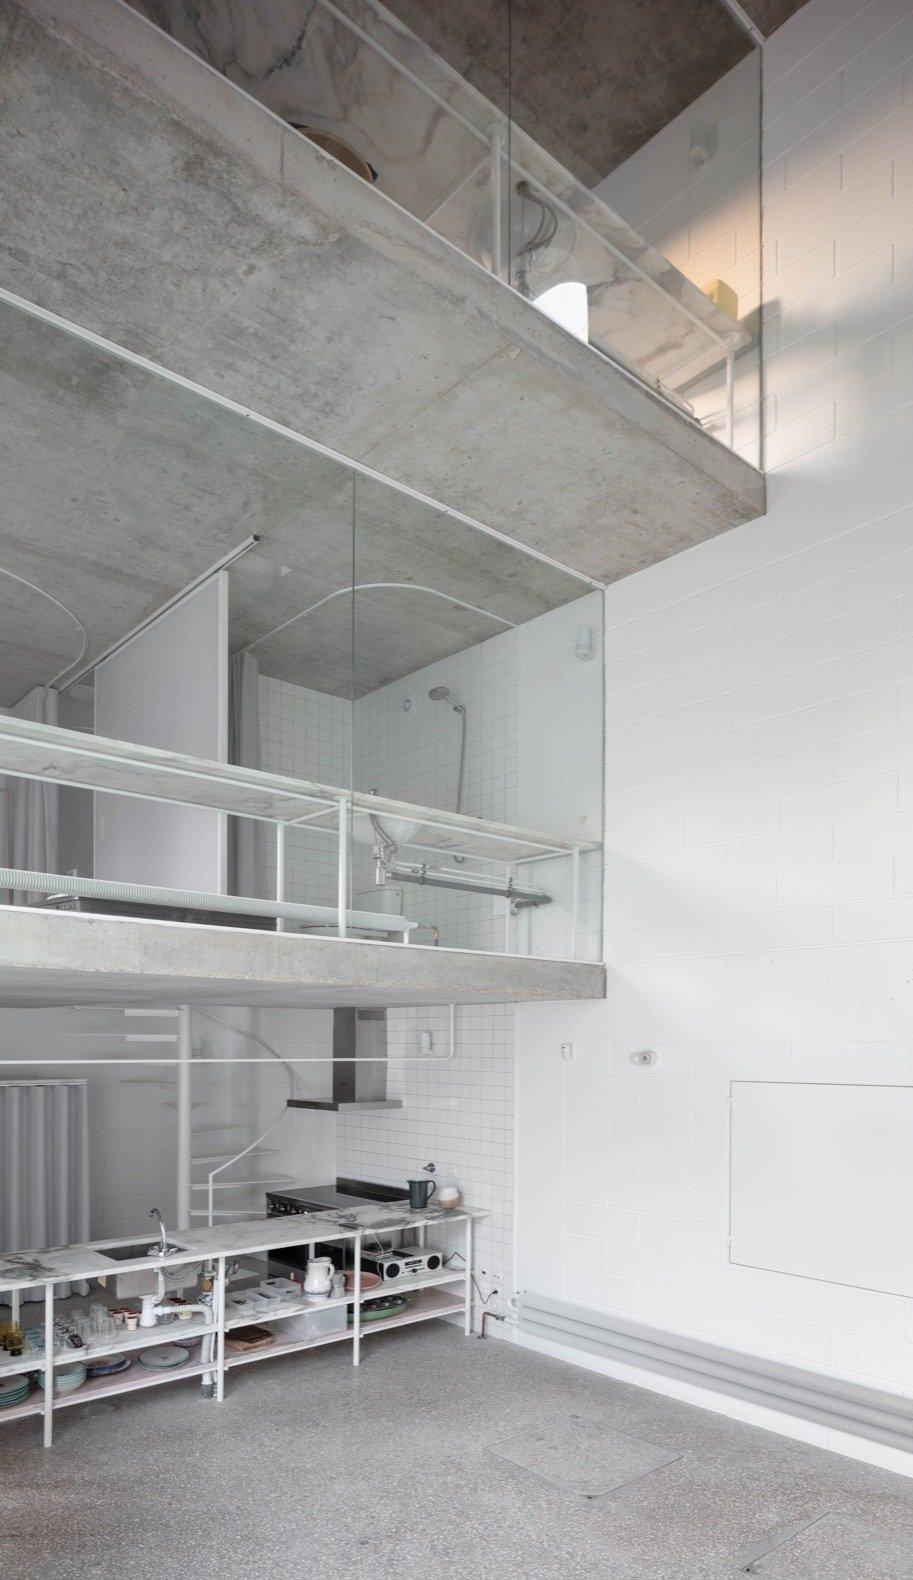 Dodged House interior